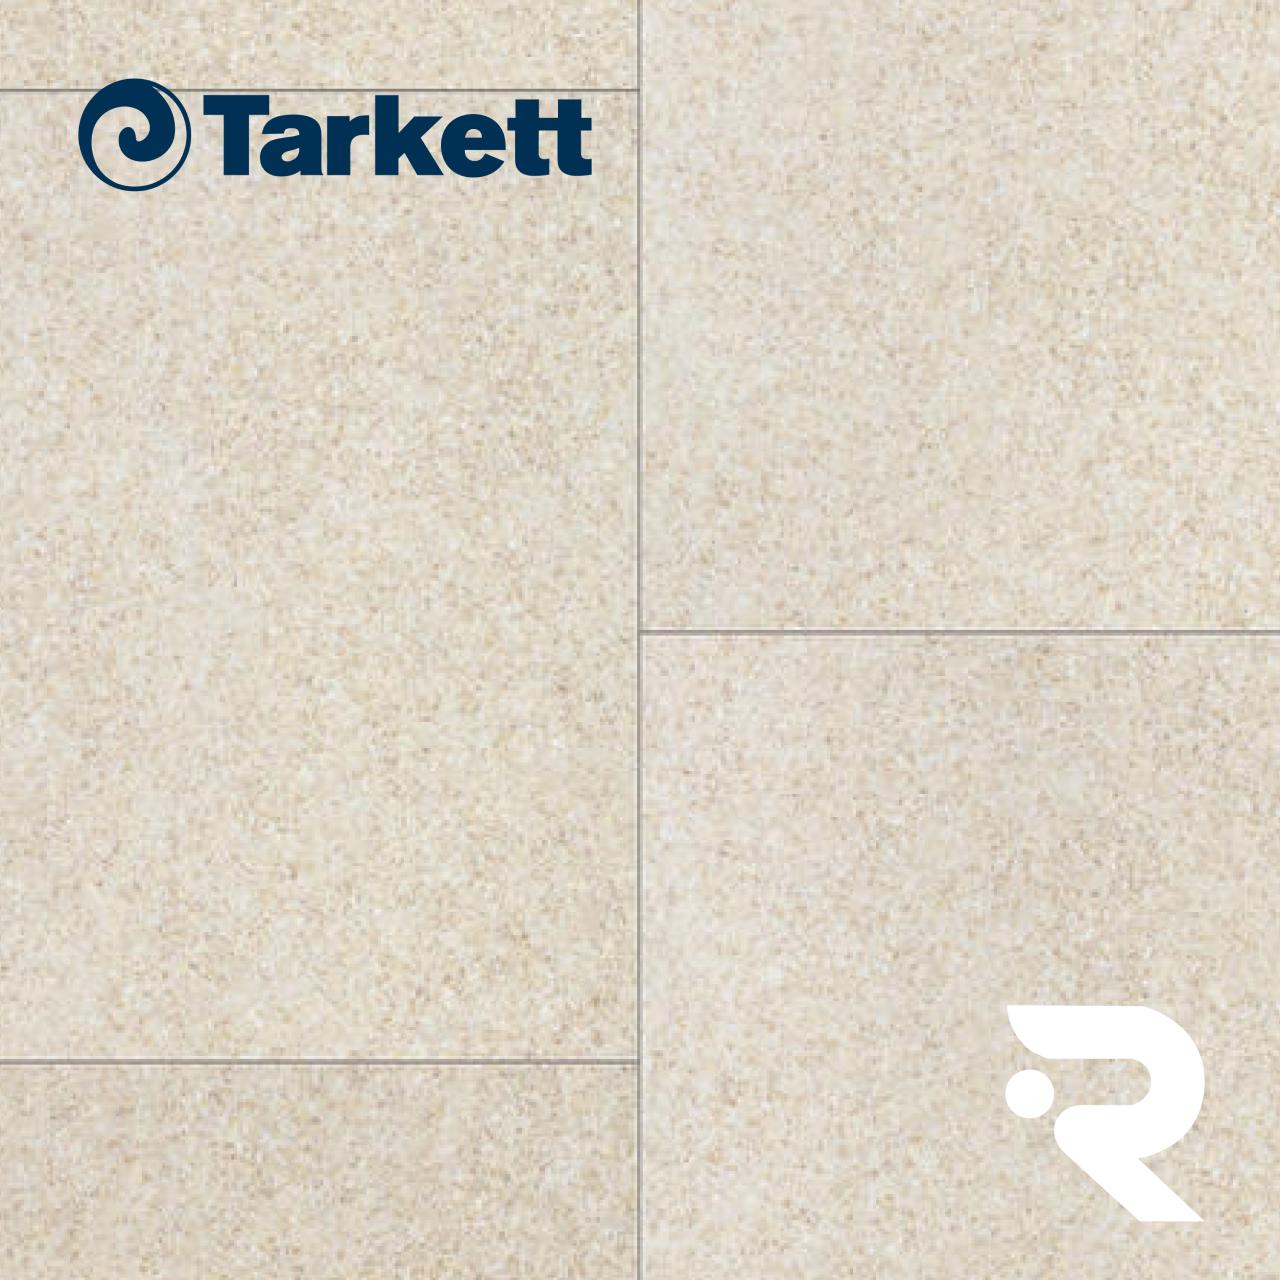 🌳 ПВХ плитка Tarkett | LOUNGE - SANDY | Art Vinyl | 457 x 457 мм